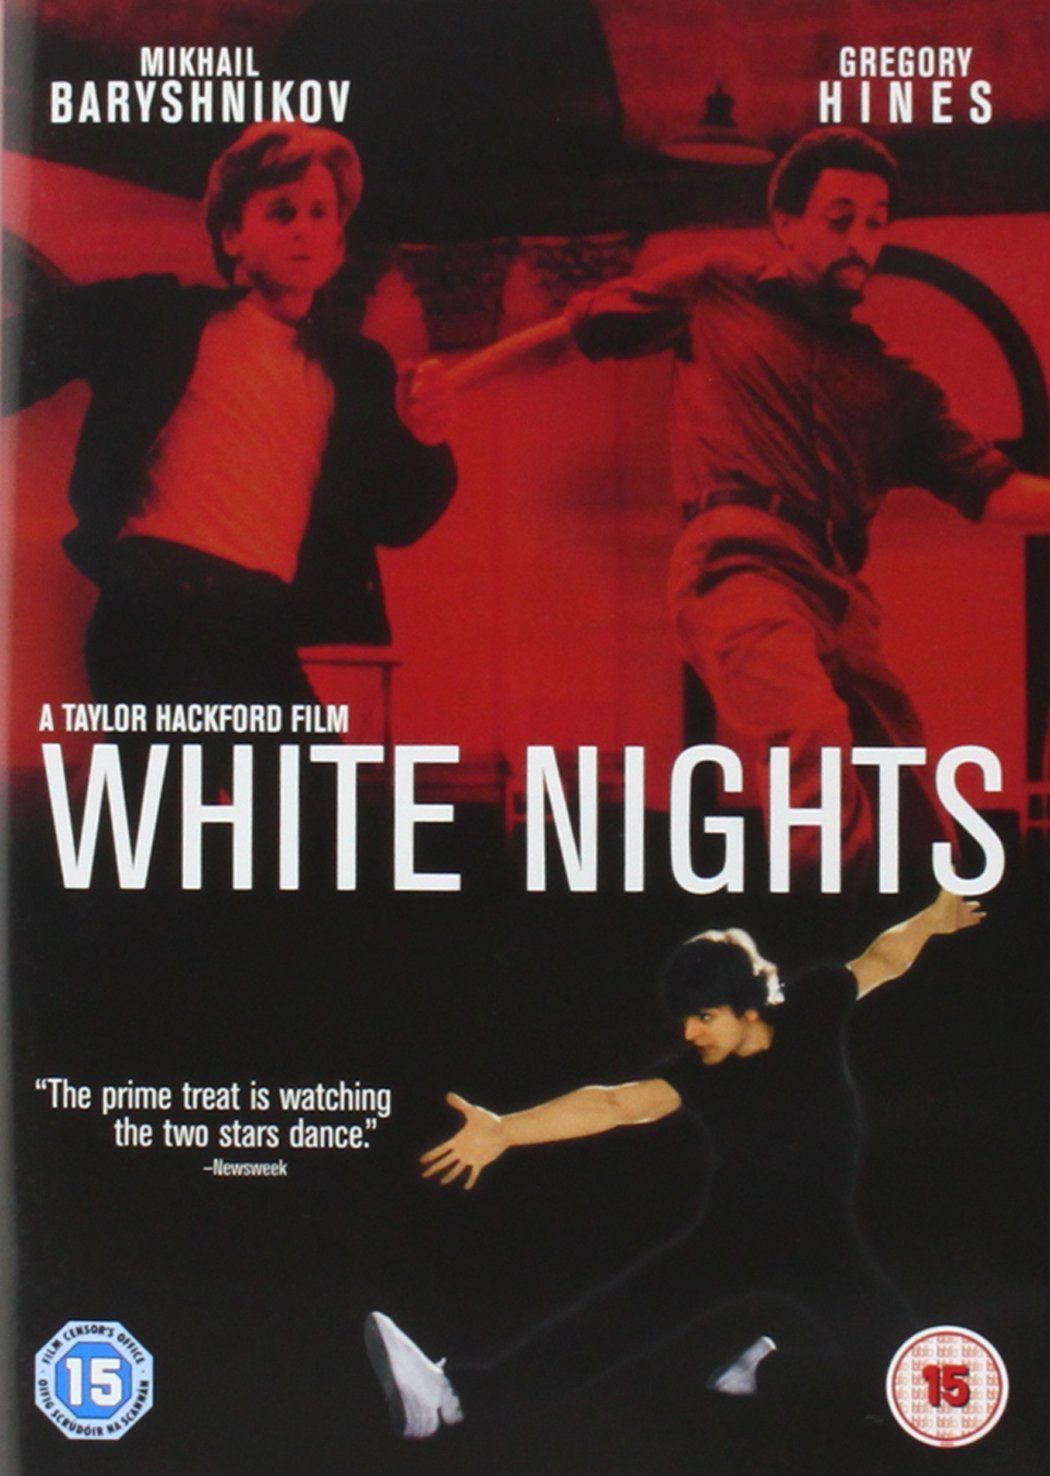 White Nights' (1985)  Mikhail Baryshnikov had a personal